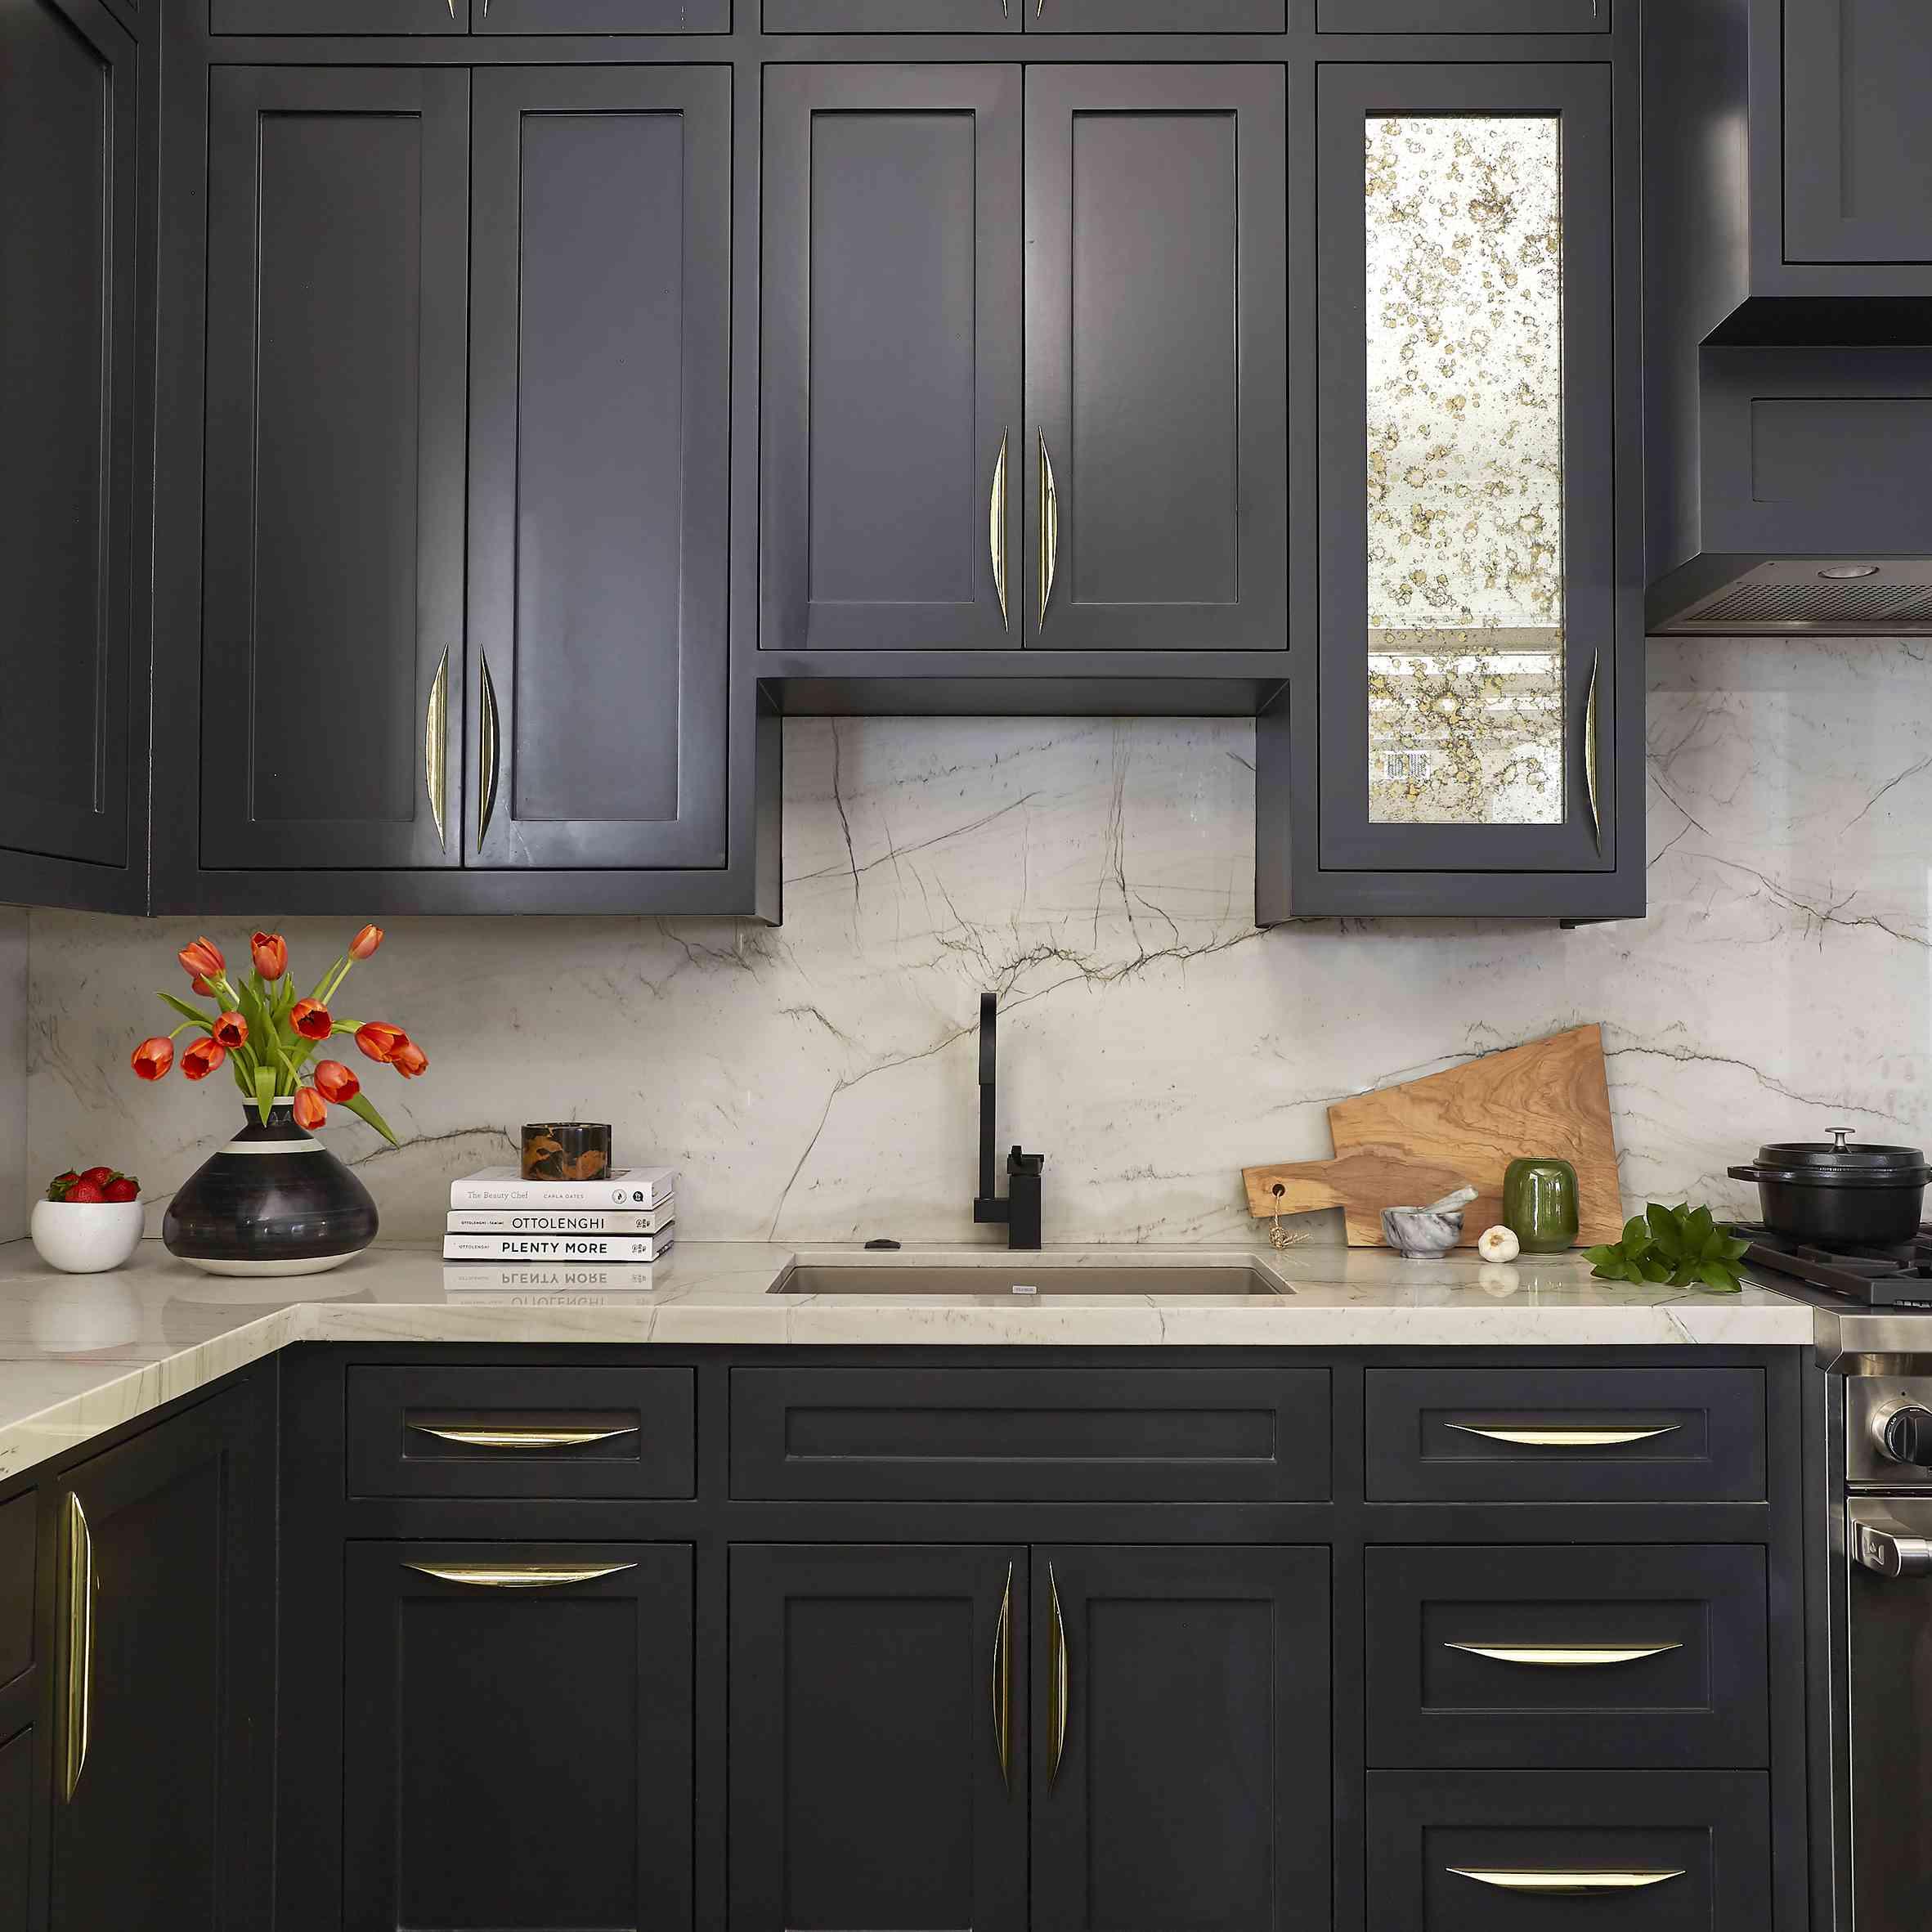 23 Marble Backsplash Ideas That Fit Any Design Style